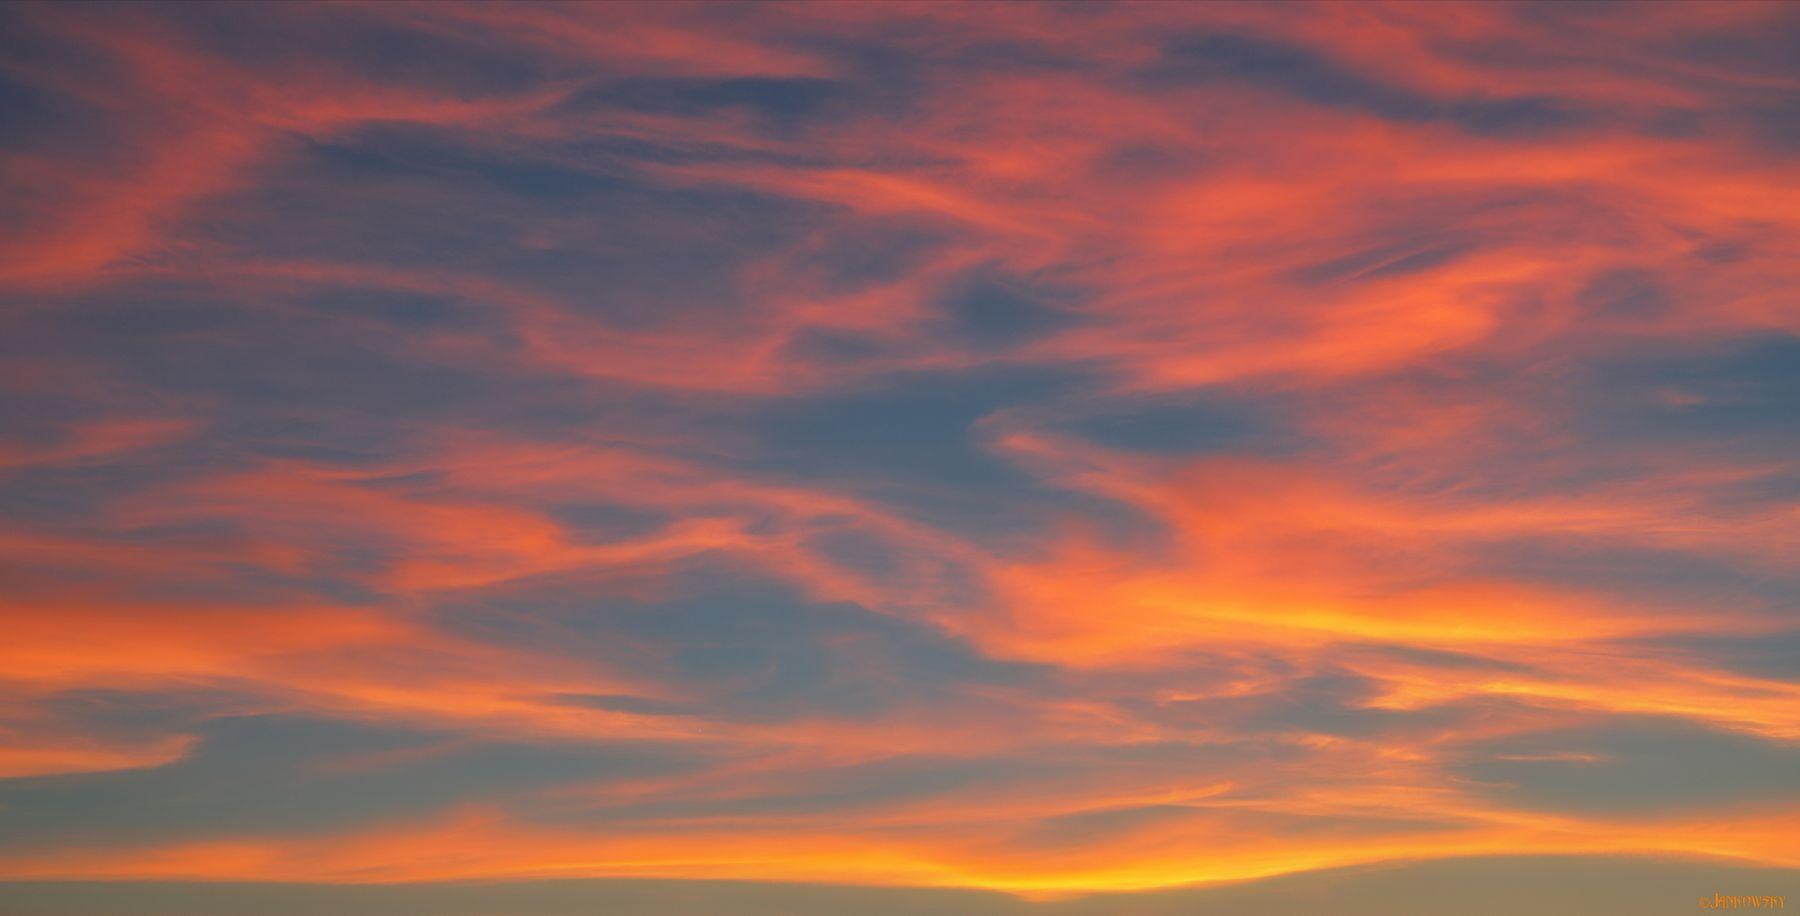 Heavenly space. Ethereal lava-flaming ornament облачность лава орнамент оранжевый узор подсветка снизу закат омск